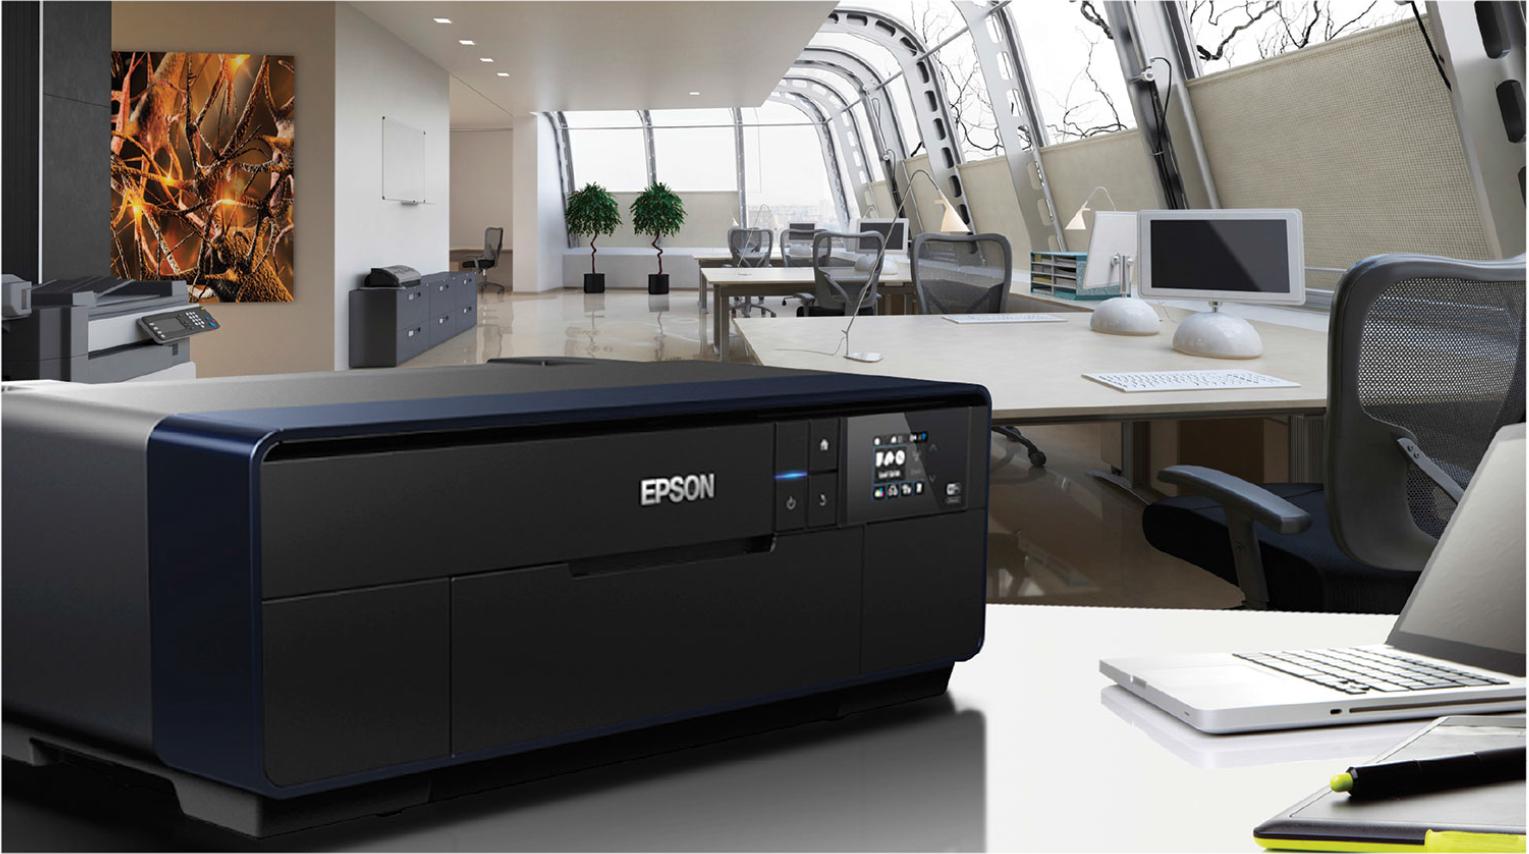 epson P607, Epson LFP. เตรื่องพิมพ์เอปสัน, Epson Printer